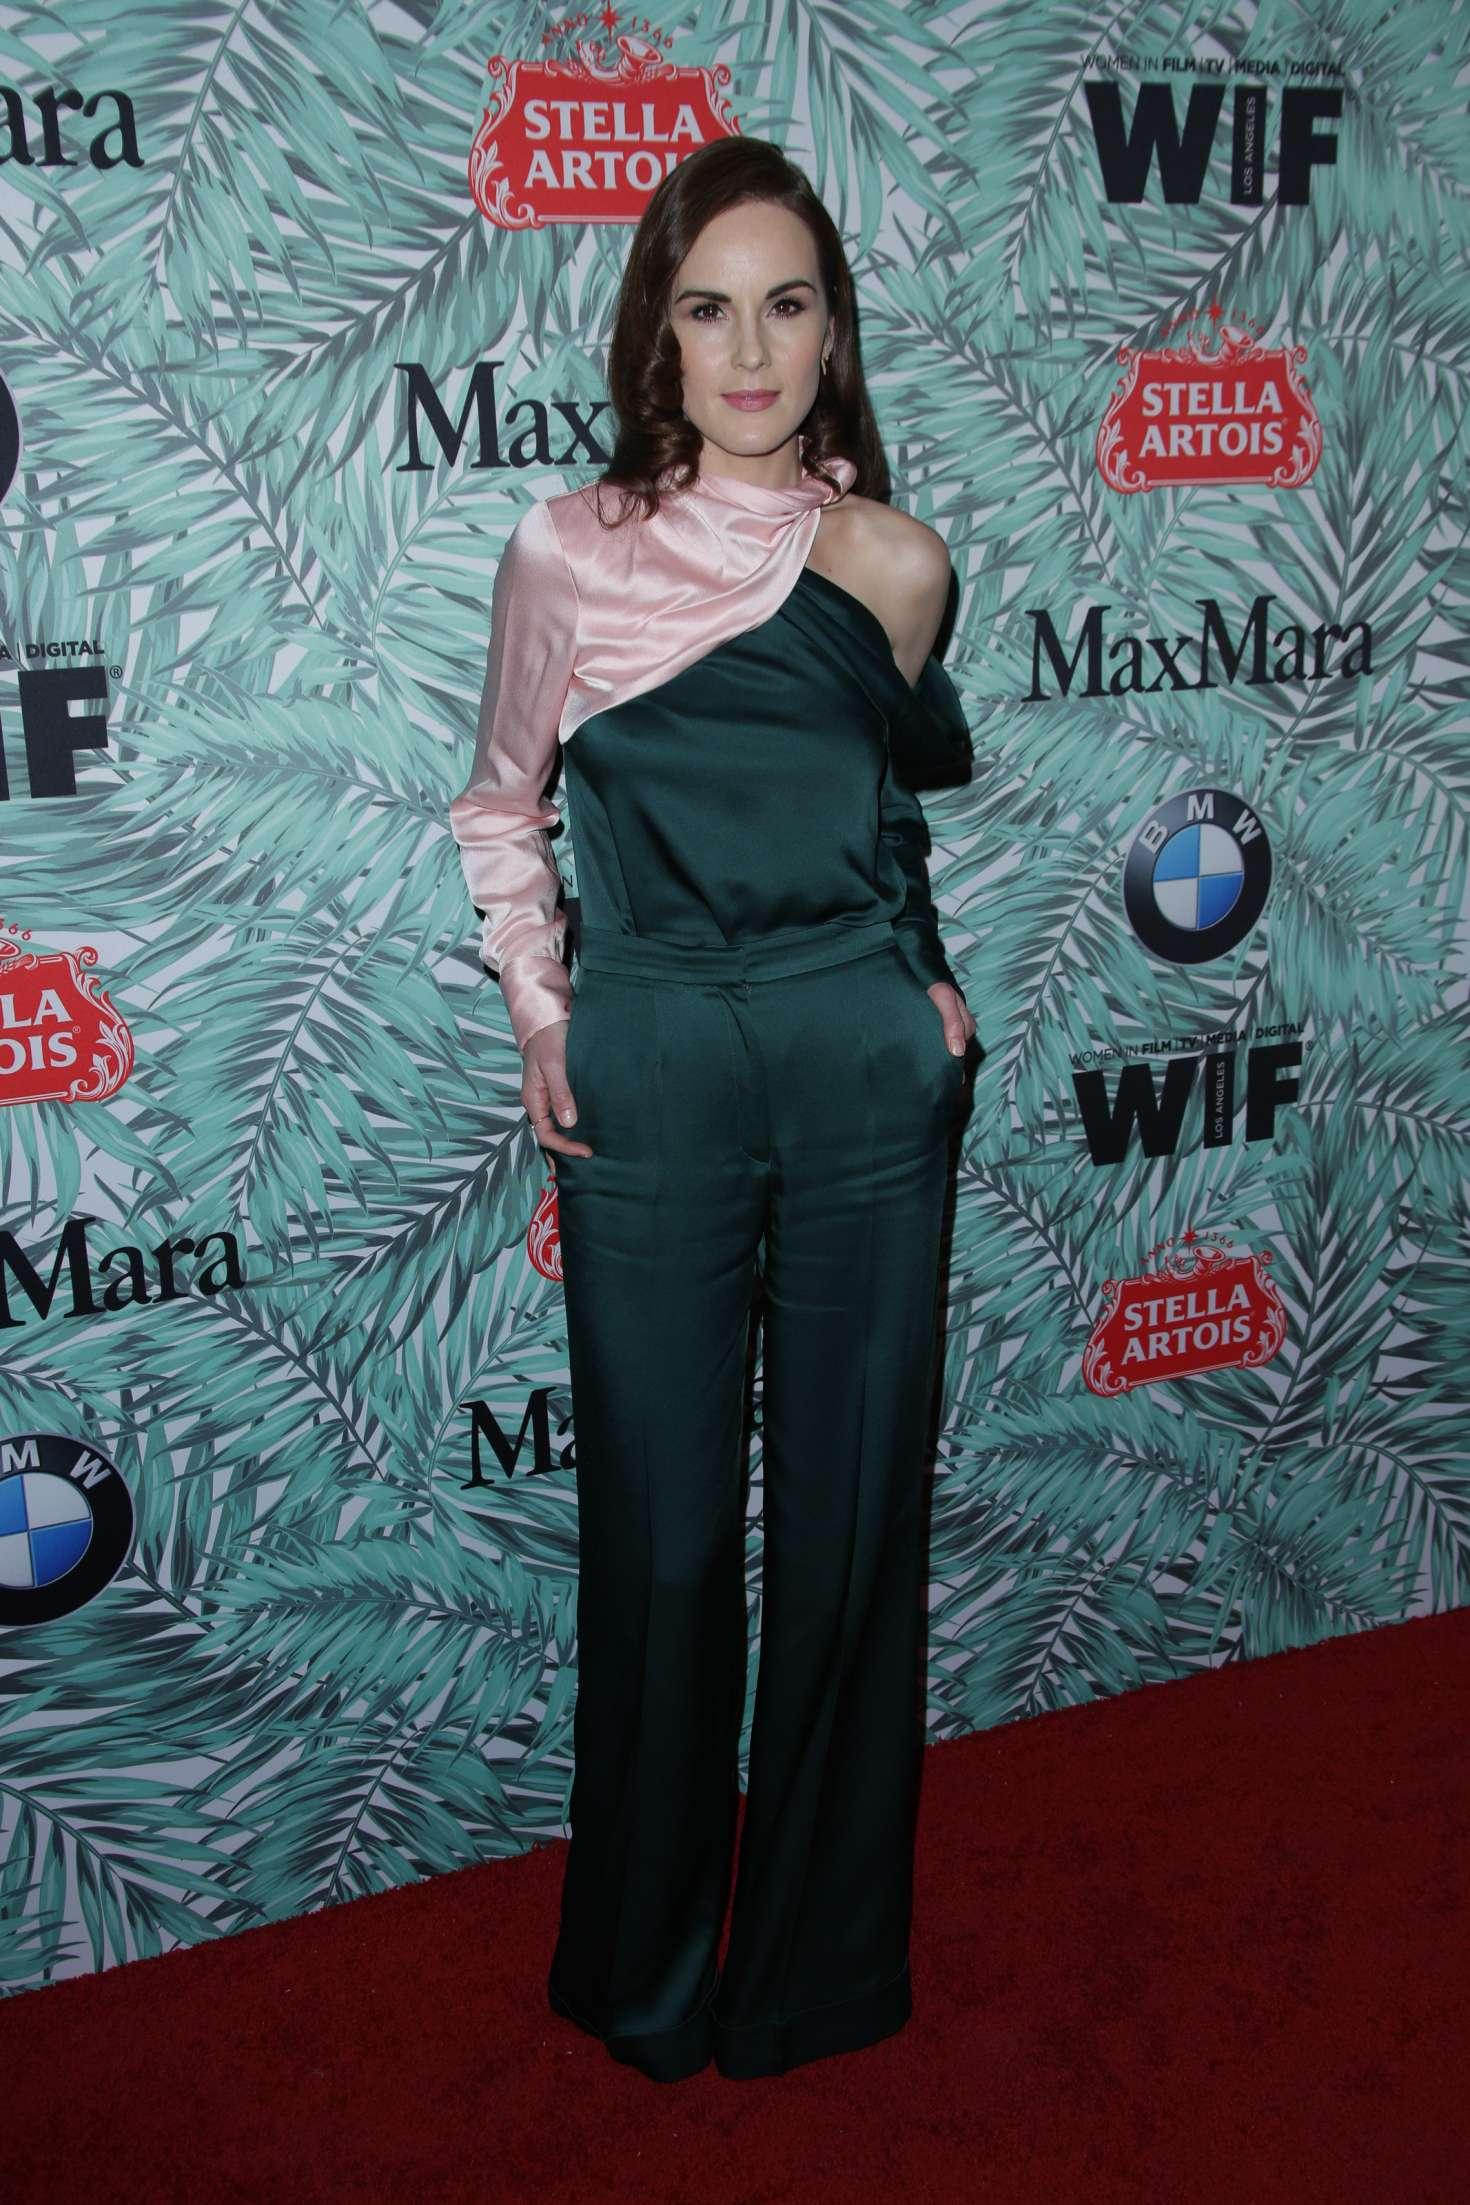 Michelle Dockery - 10th Annual Women in Film Pre-Oscar Cocktail Party in LA